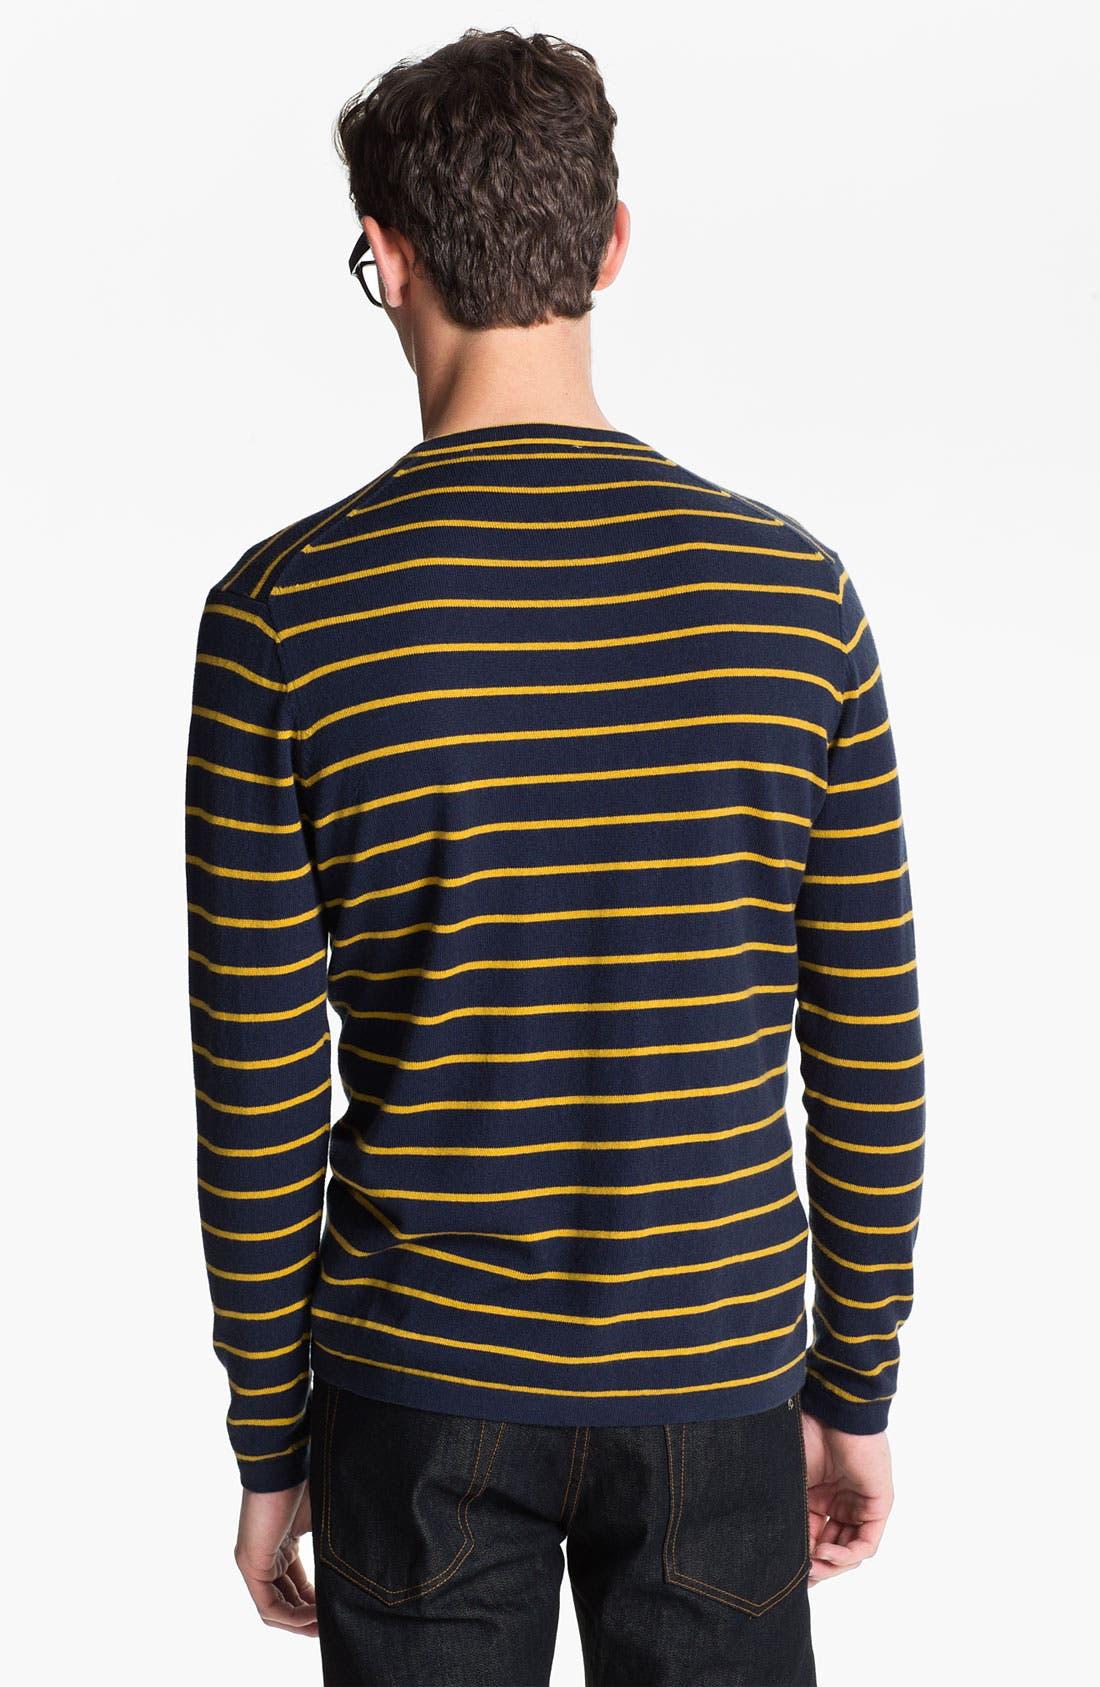 Alternate Image 2  - Cardigan by Lynne Hiriak 'Serge' Merino Wool V-Neck Sweater